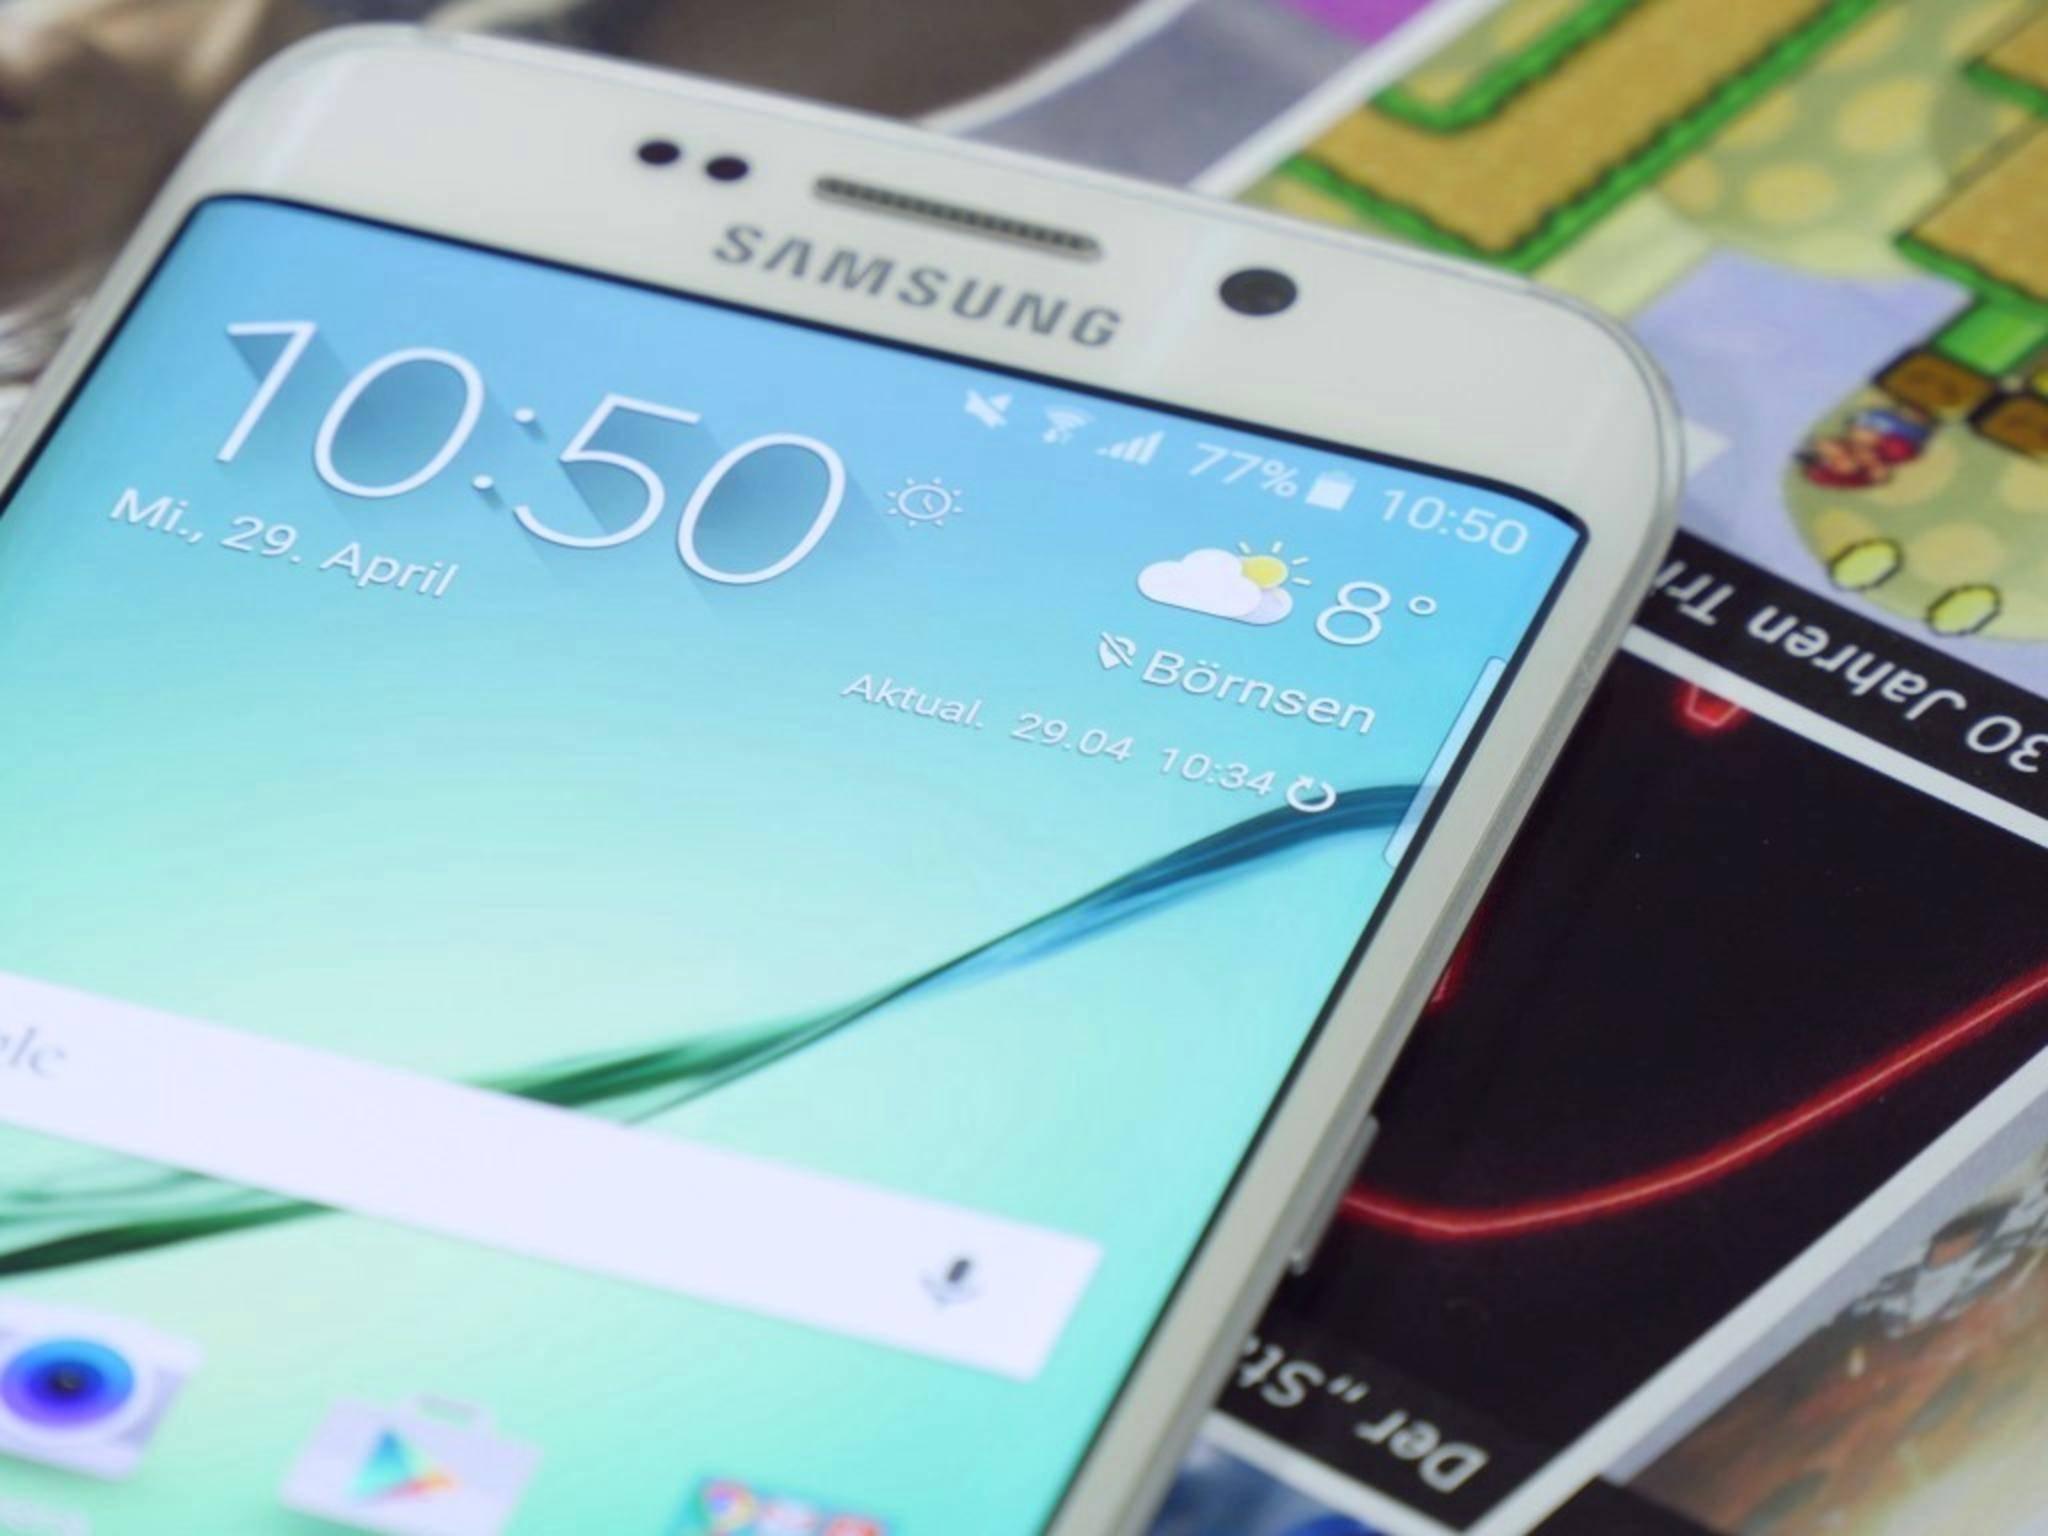 Samsung Galaxy S6 Edge 4